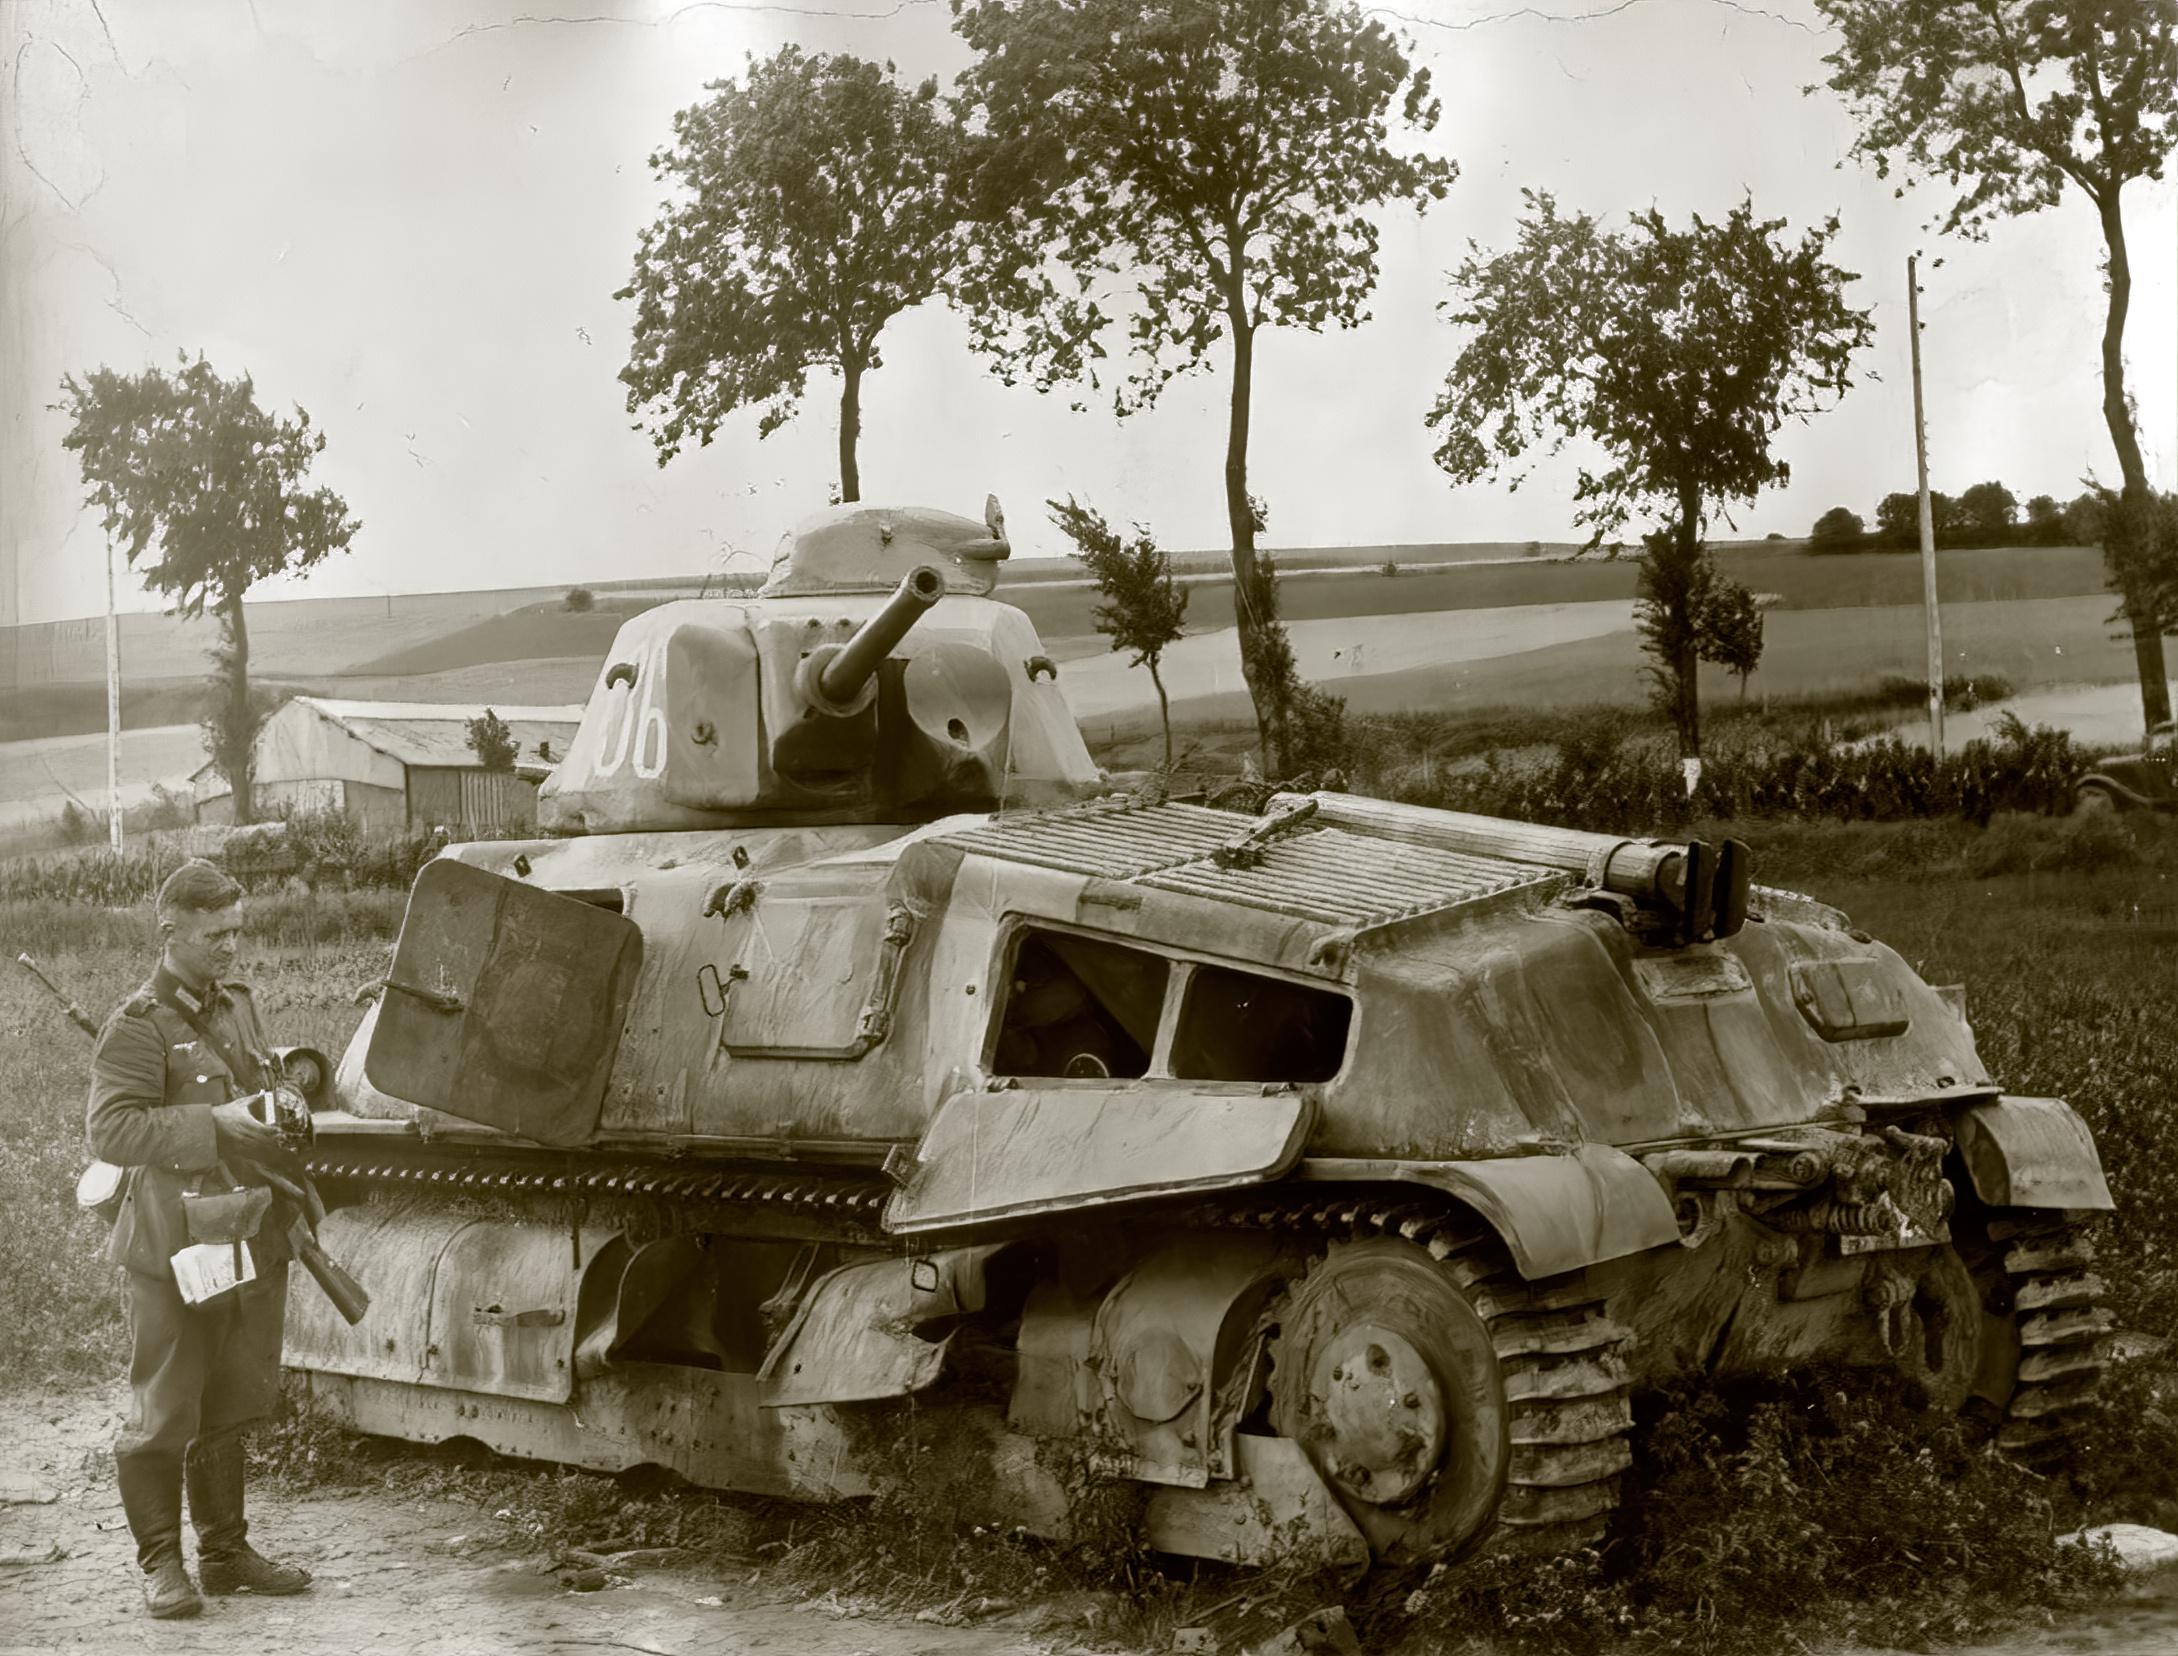 French Army Somua S35 White 36 abandoned along a roadside France June 1940 ebay 01